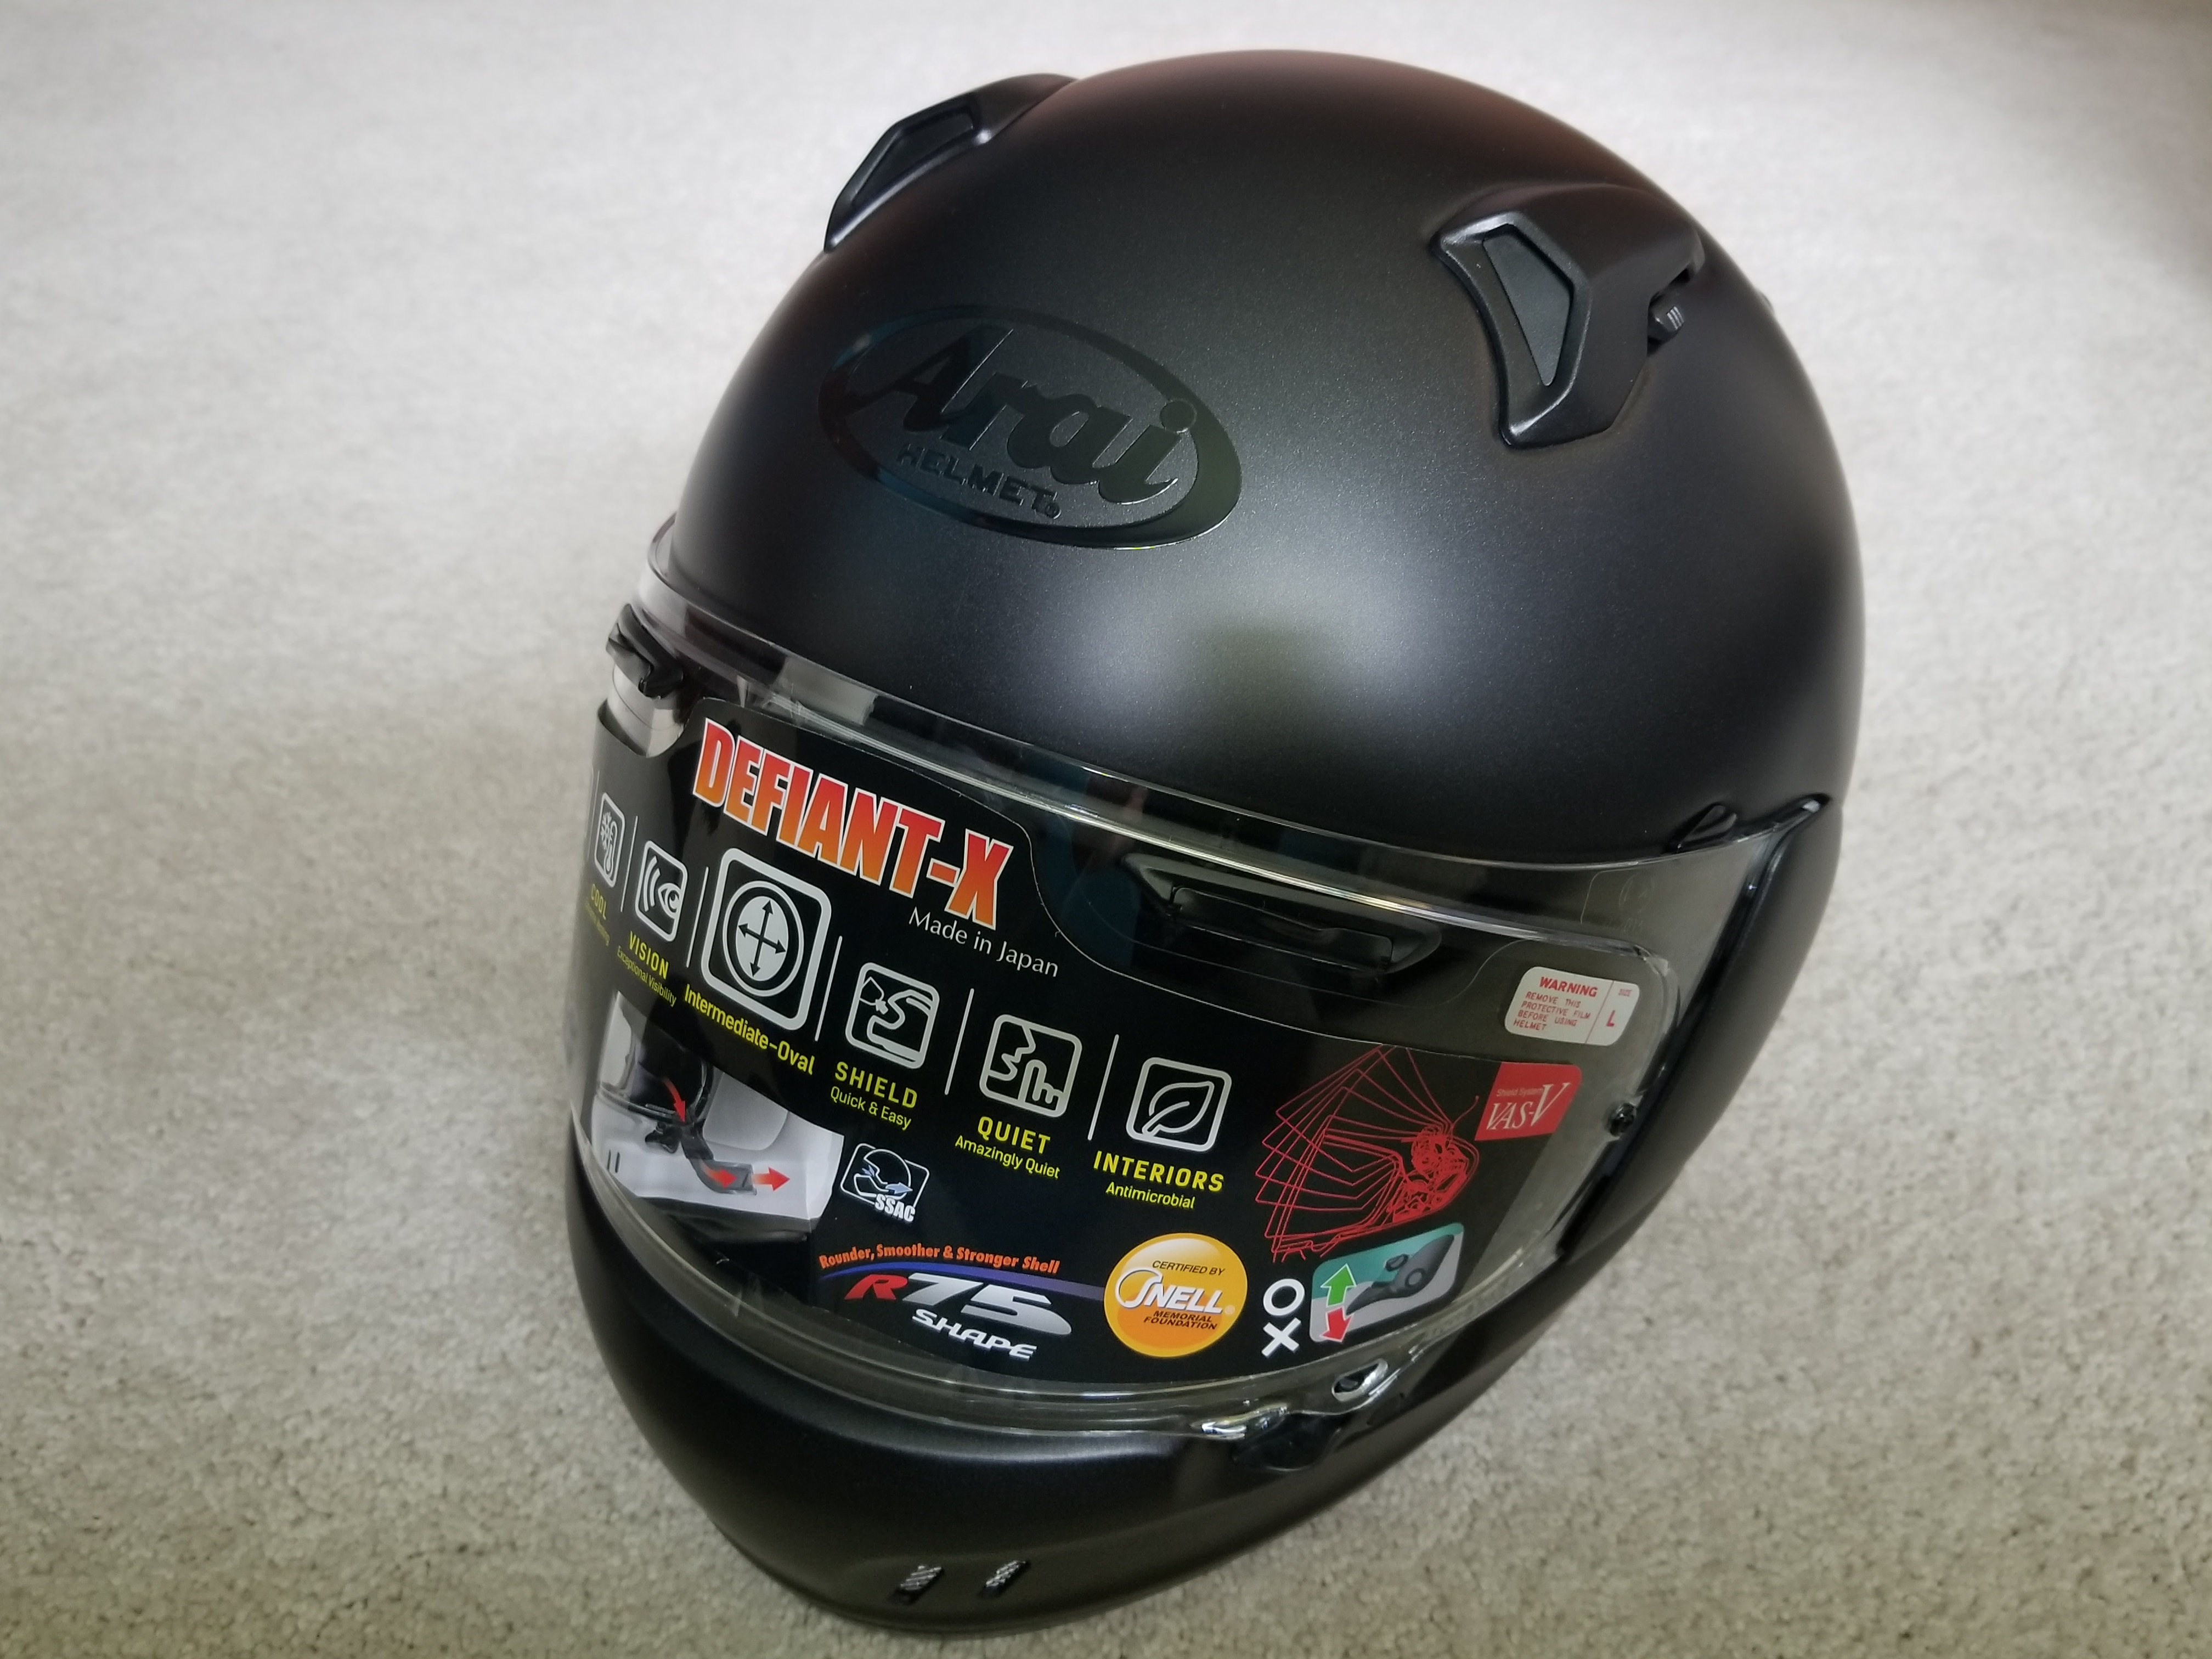 For Sale New Arai Defiant-X (Renegade) Helmet Black Large (SOLD) 20180613